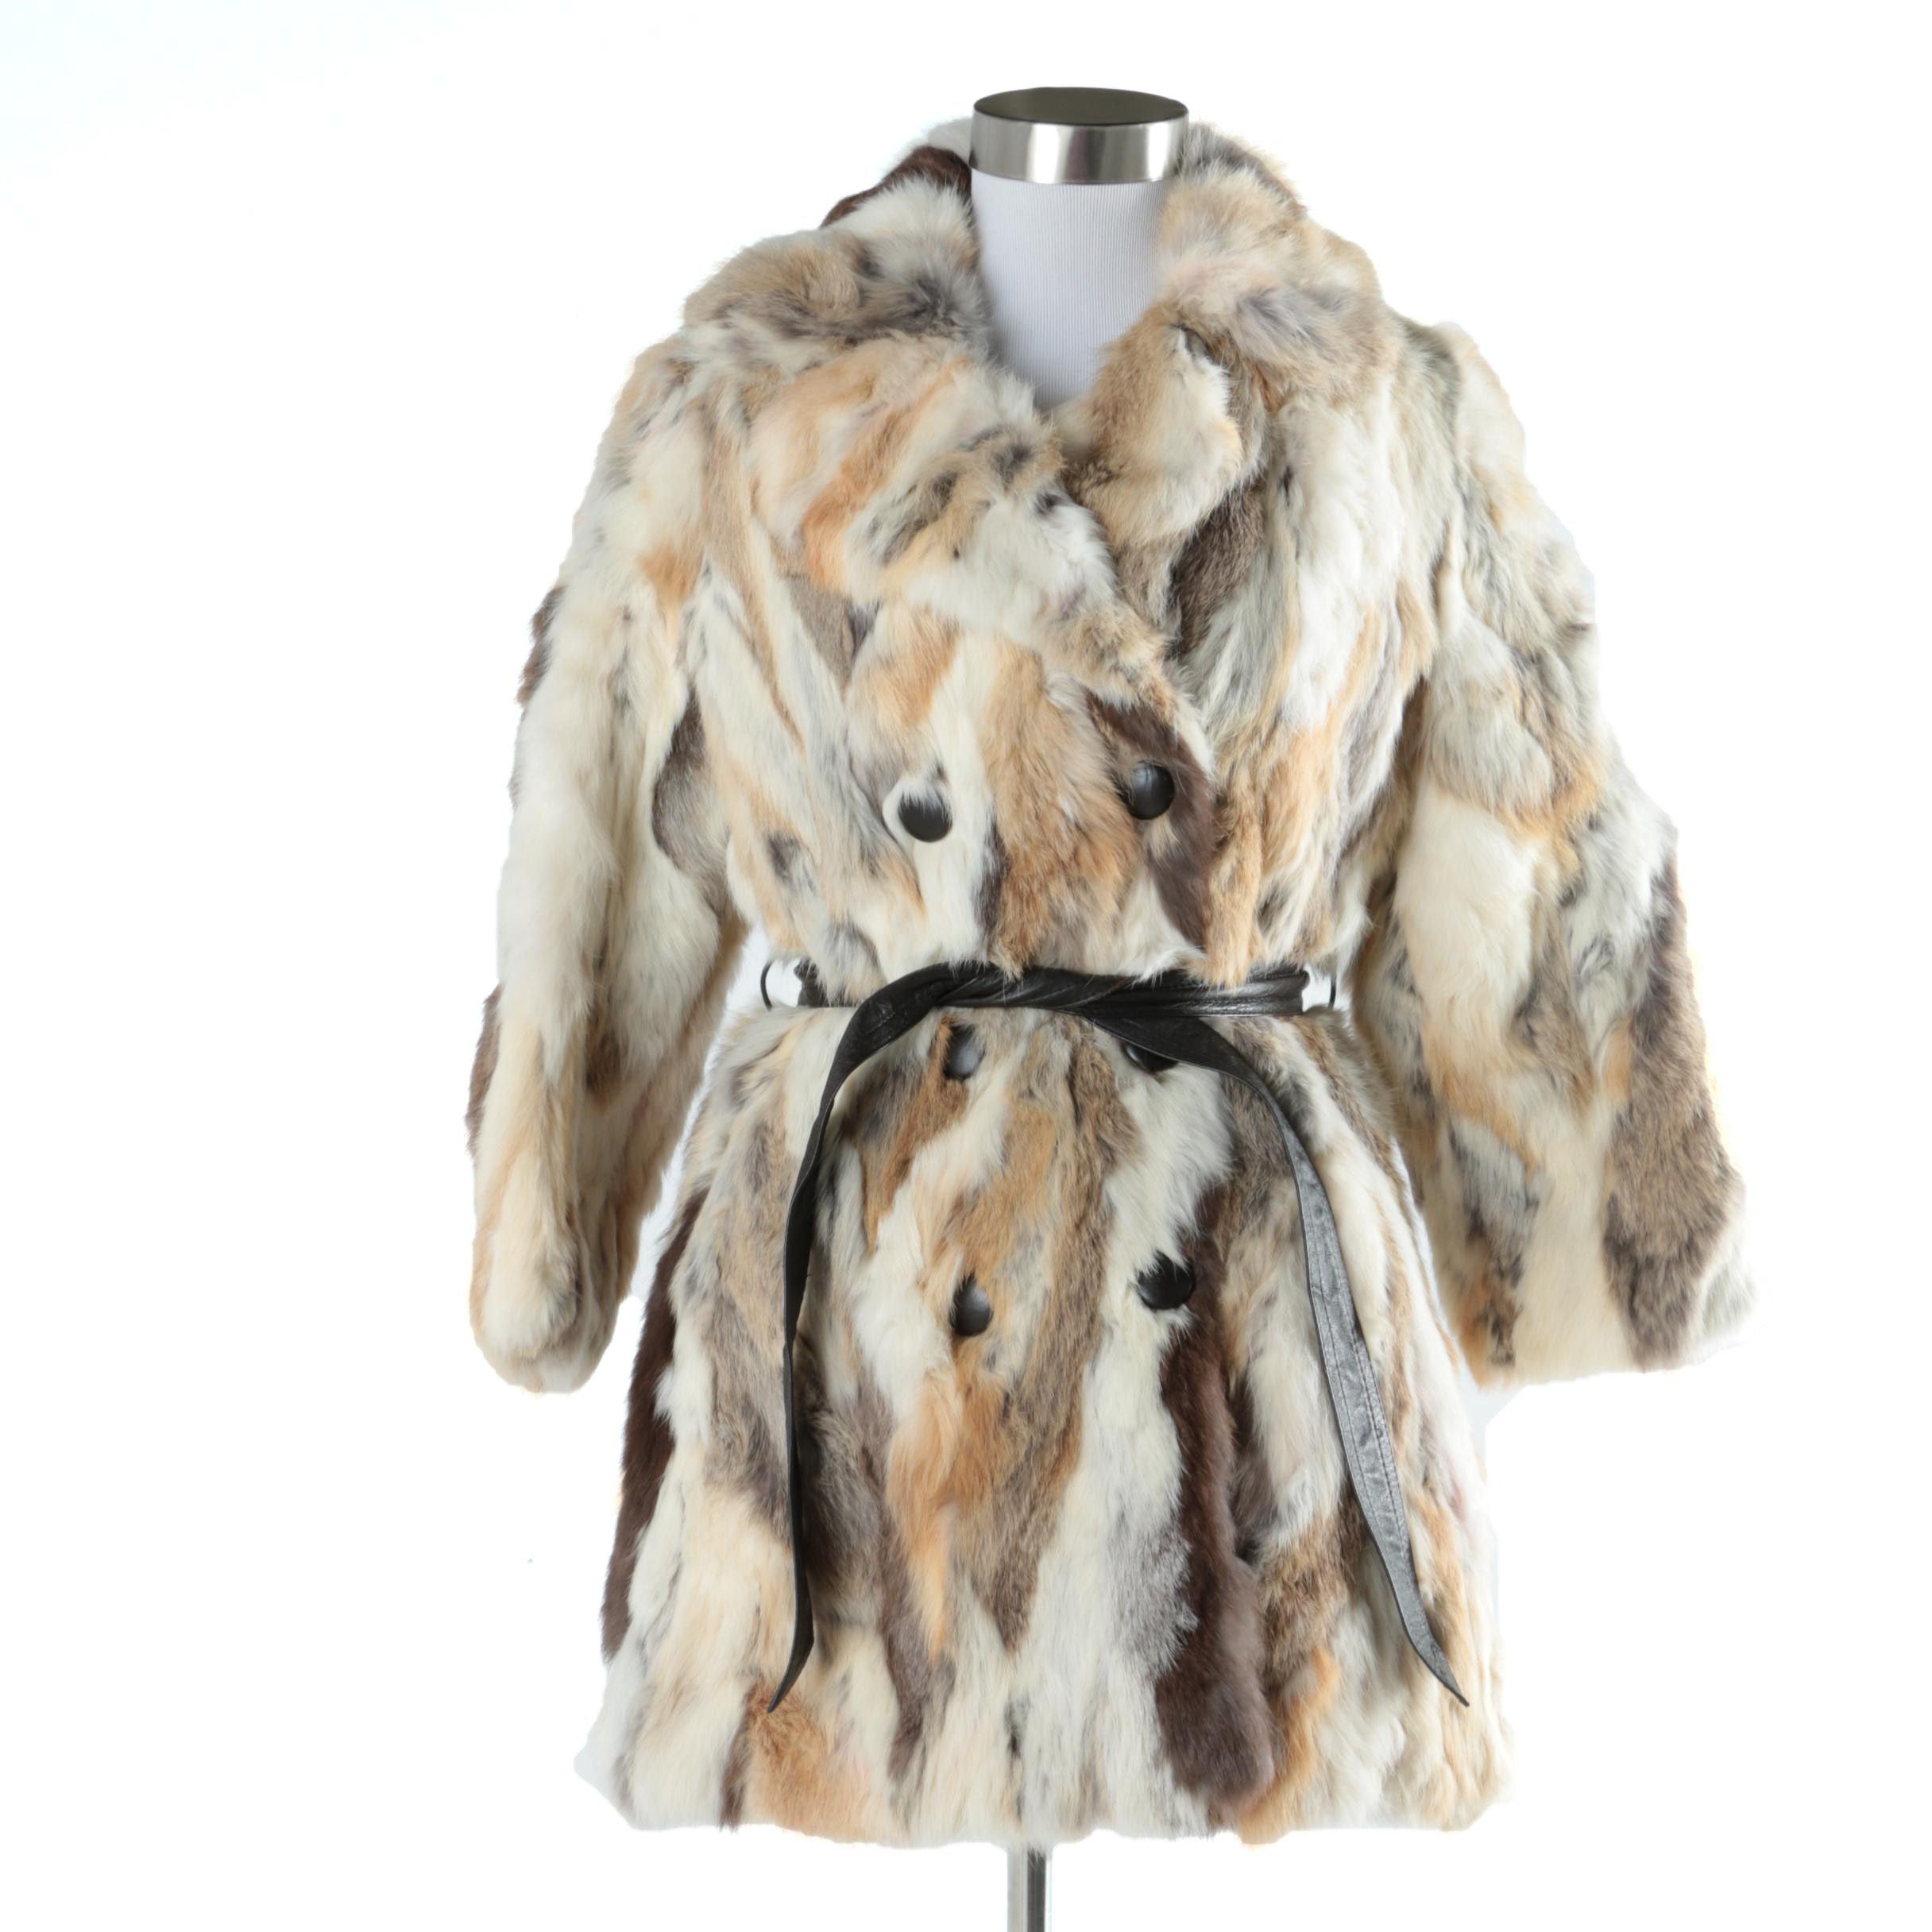 Vintage Rabbit Fur Coat